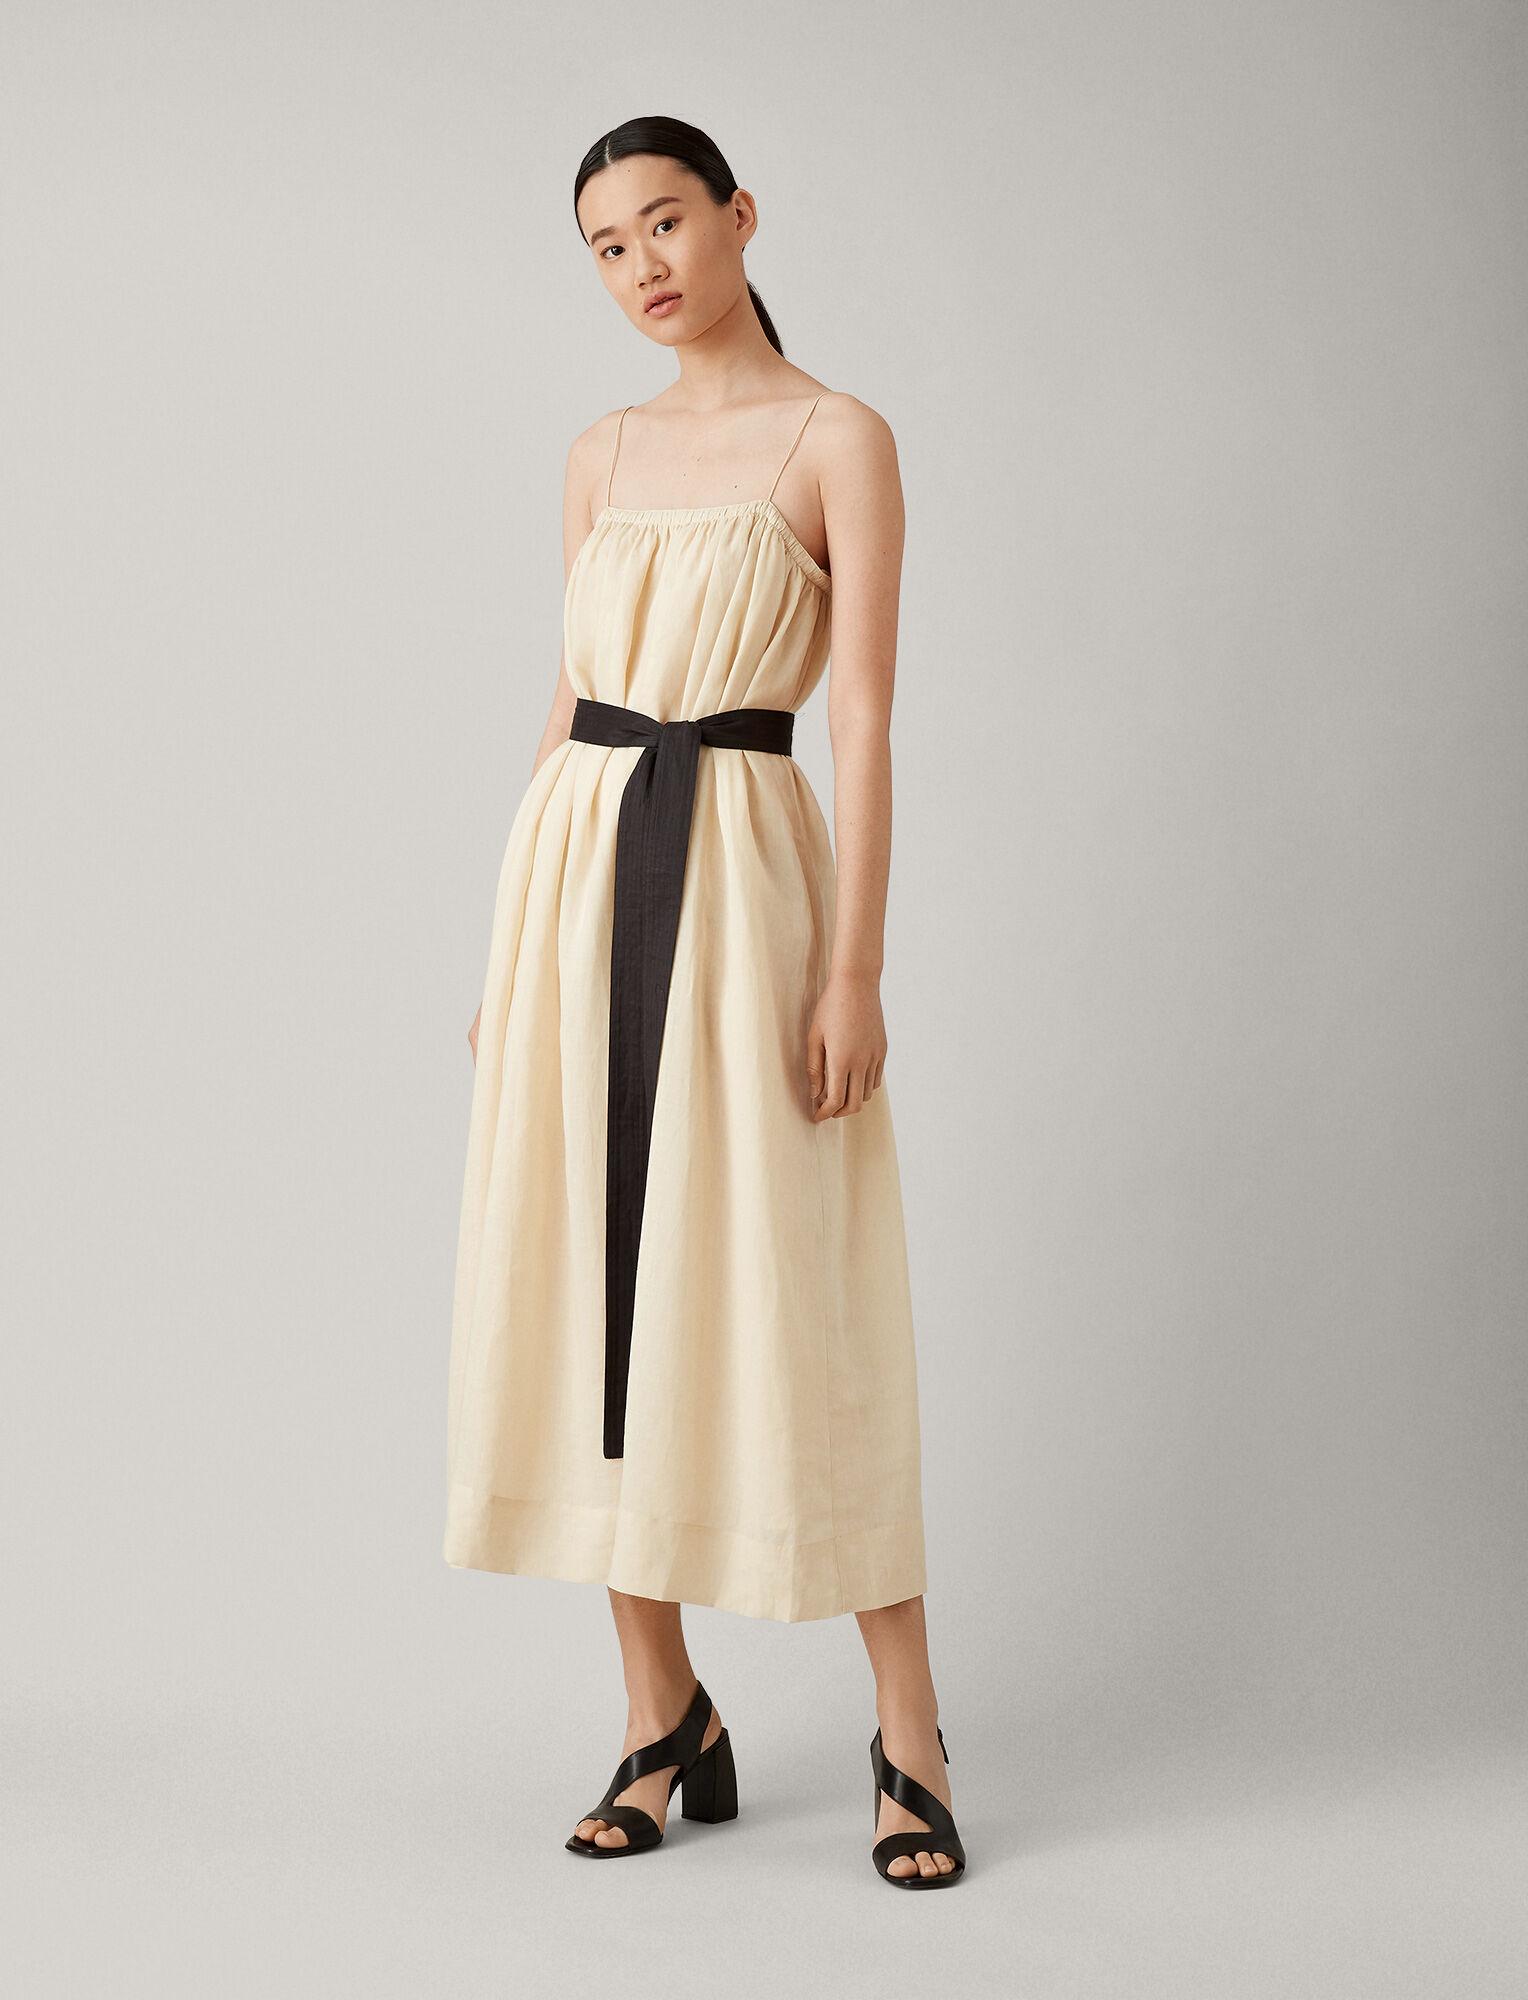 688f3b18f44 ... Joseph, Tilda Ramie Voile Dress, in PEARL ...